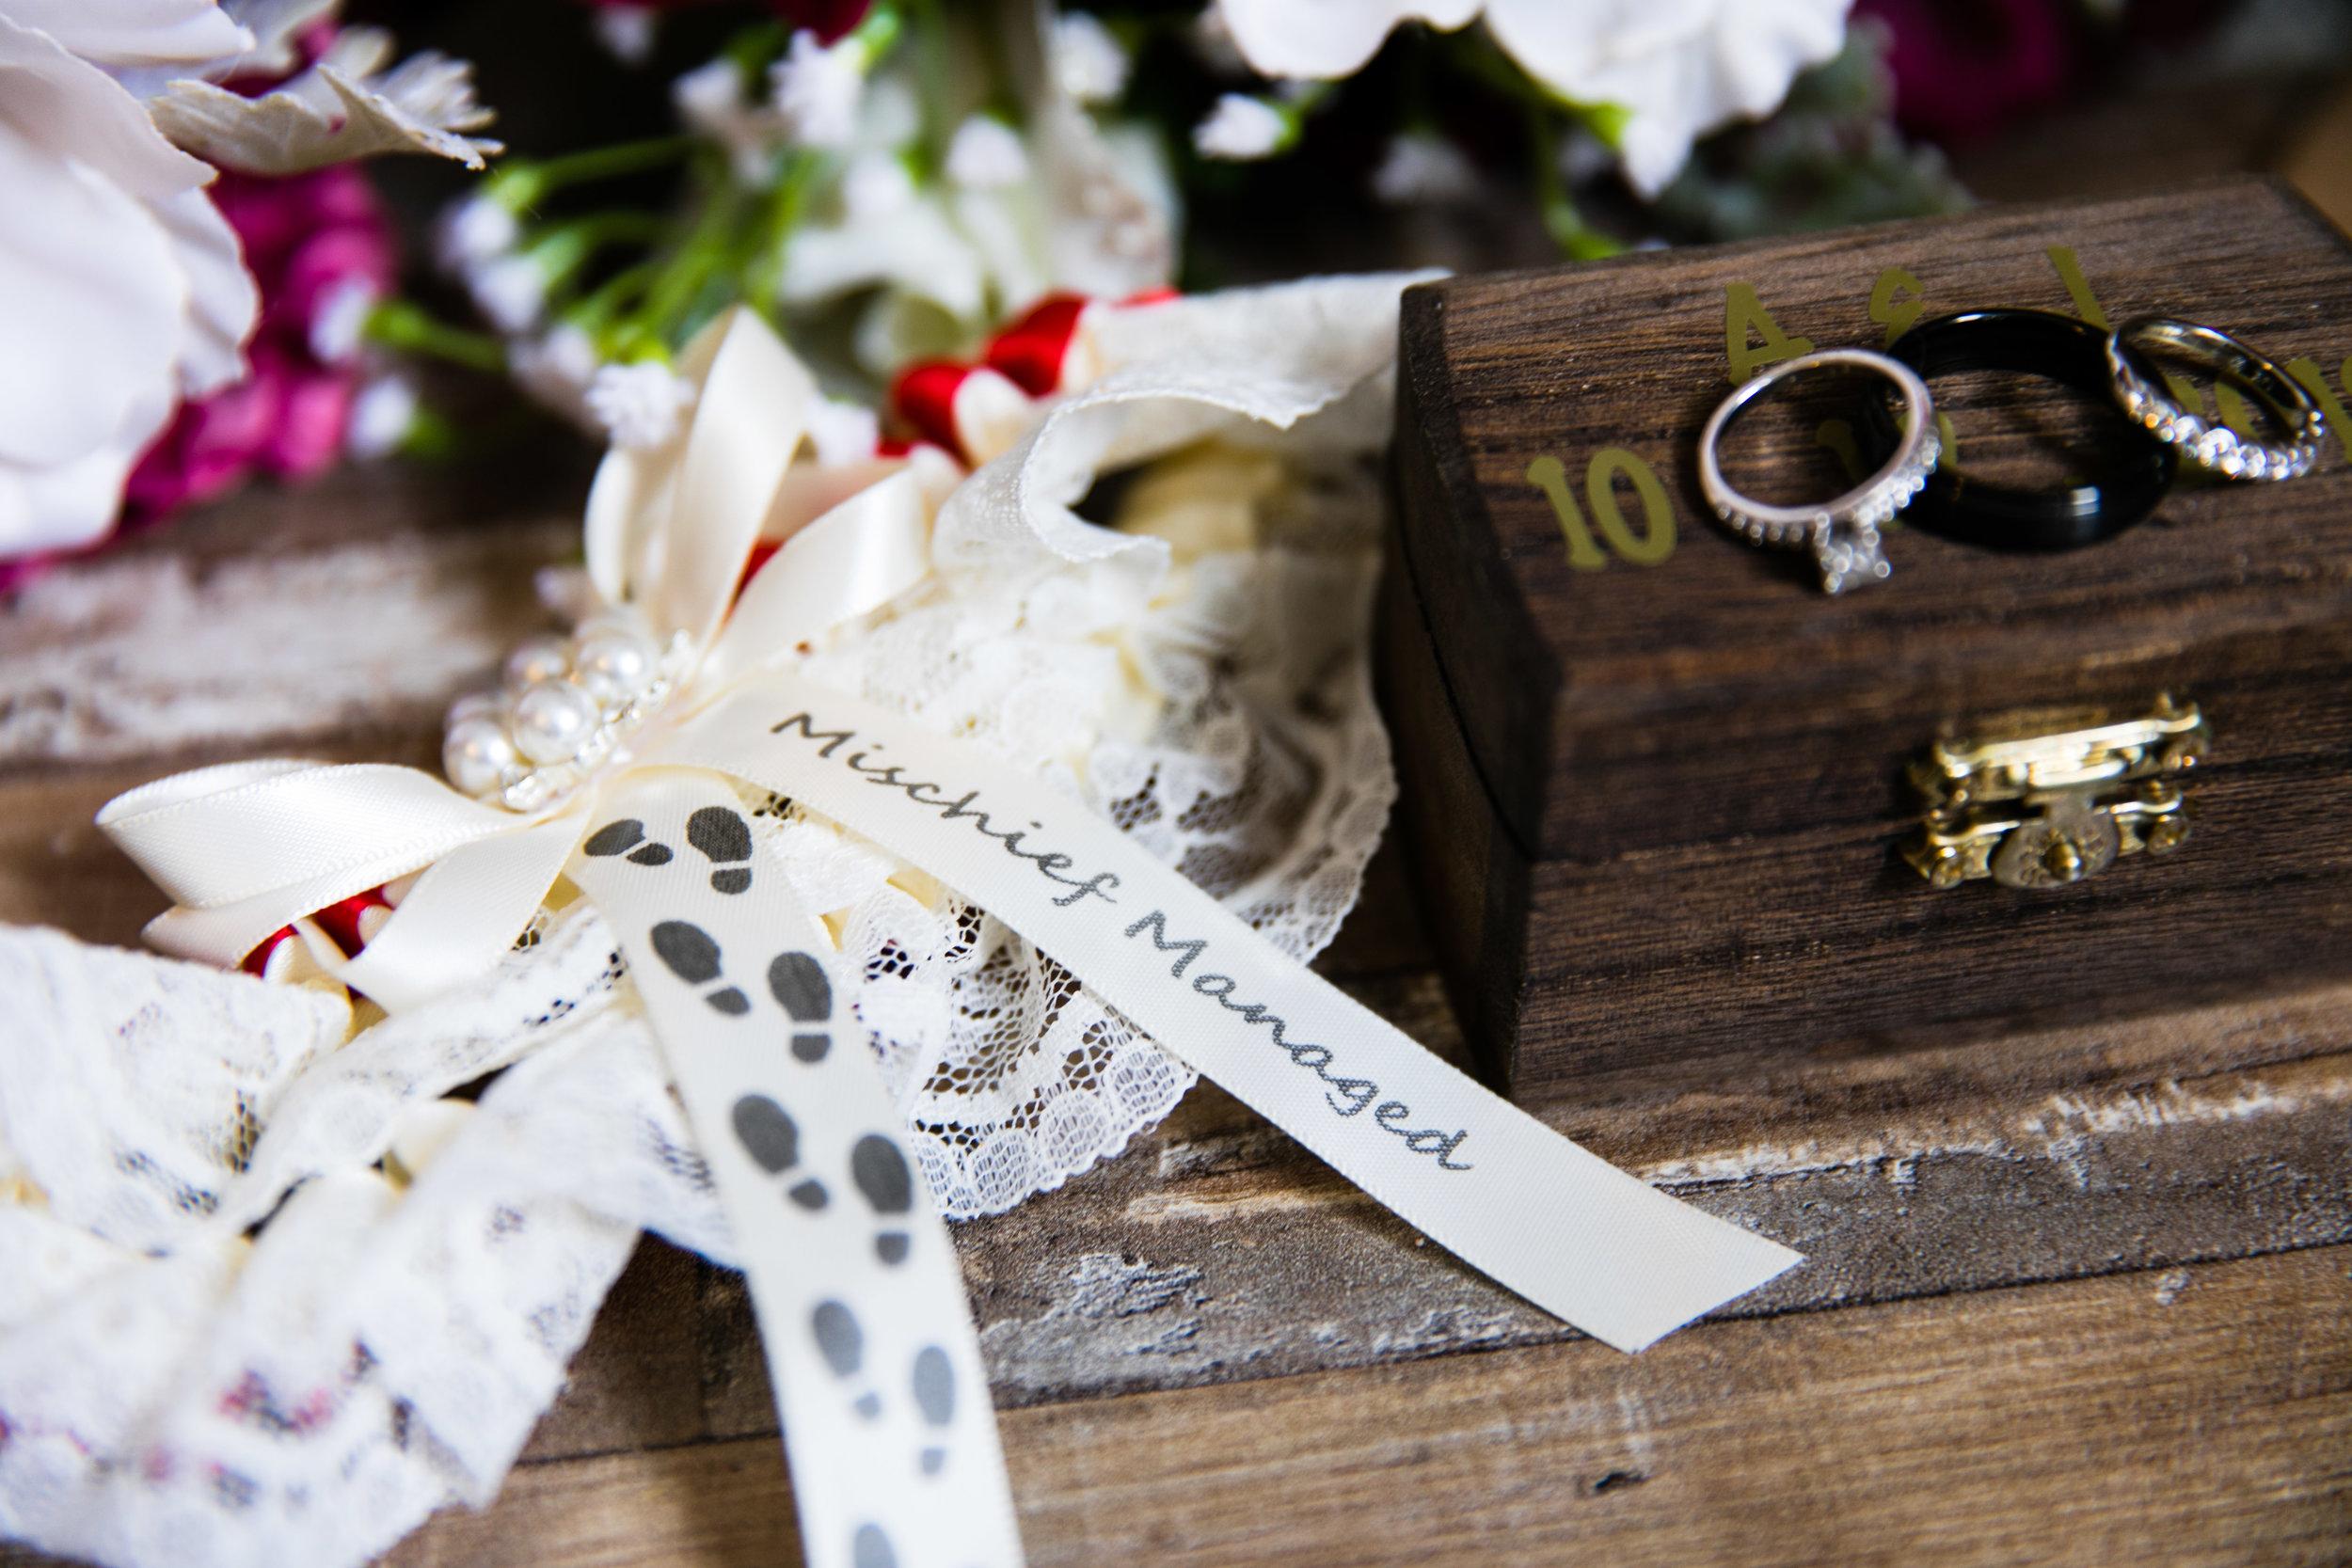 Ashly and Joe - Felt Factory Wedding - Harry Potter Themed Wedding - 010.jpg